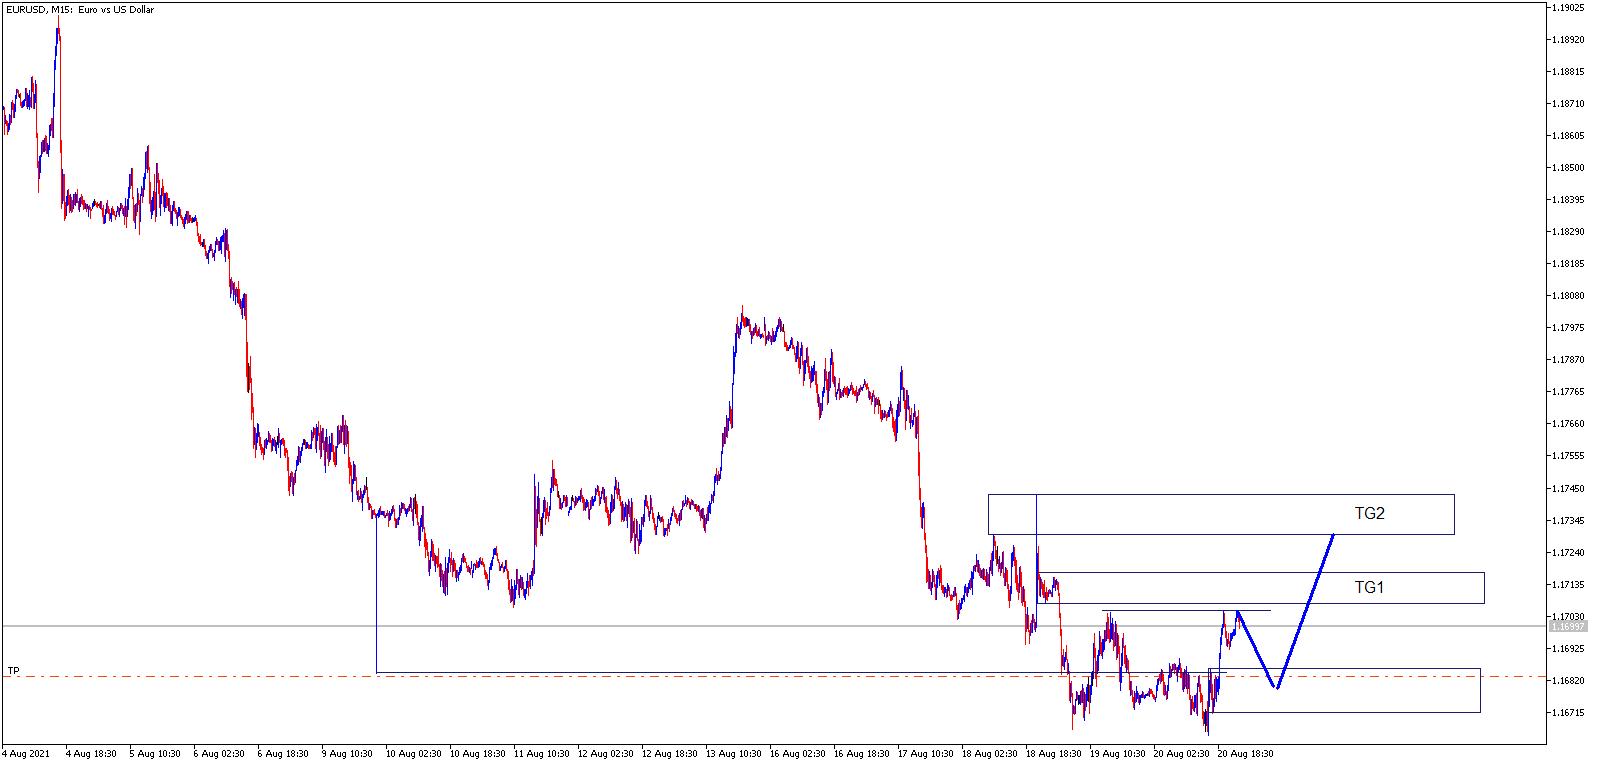 EUR/USD M15 Price action